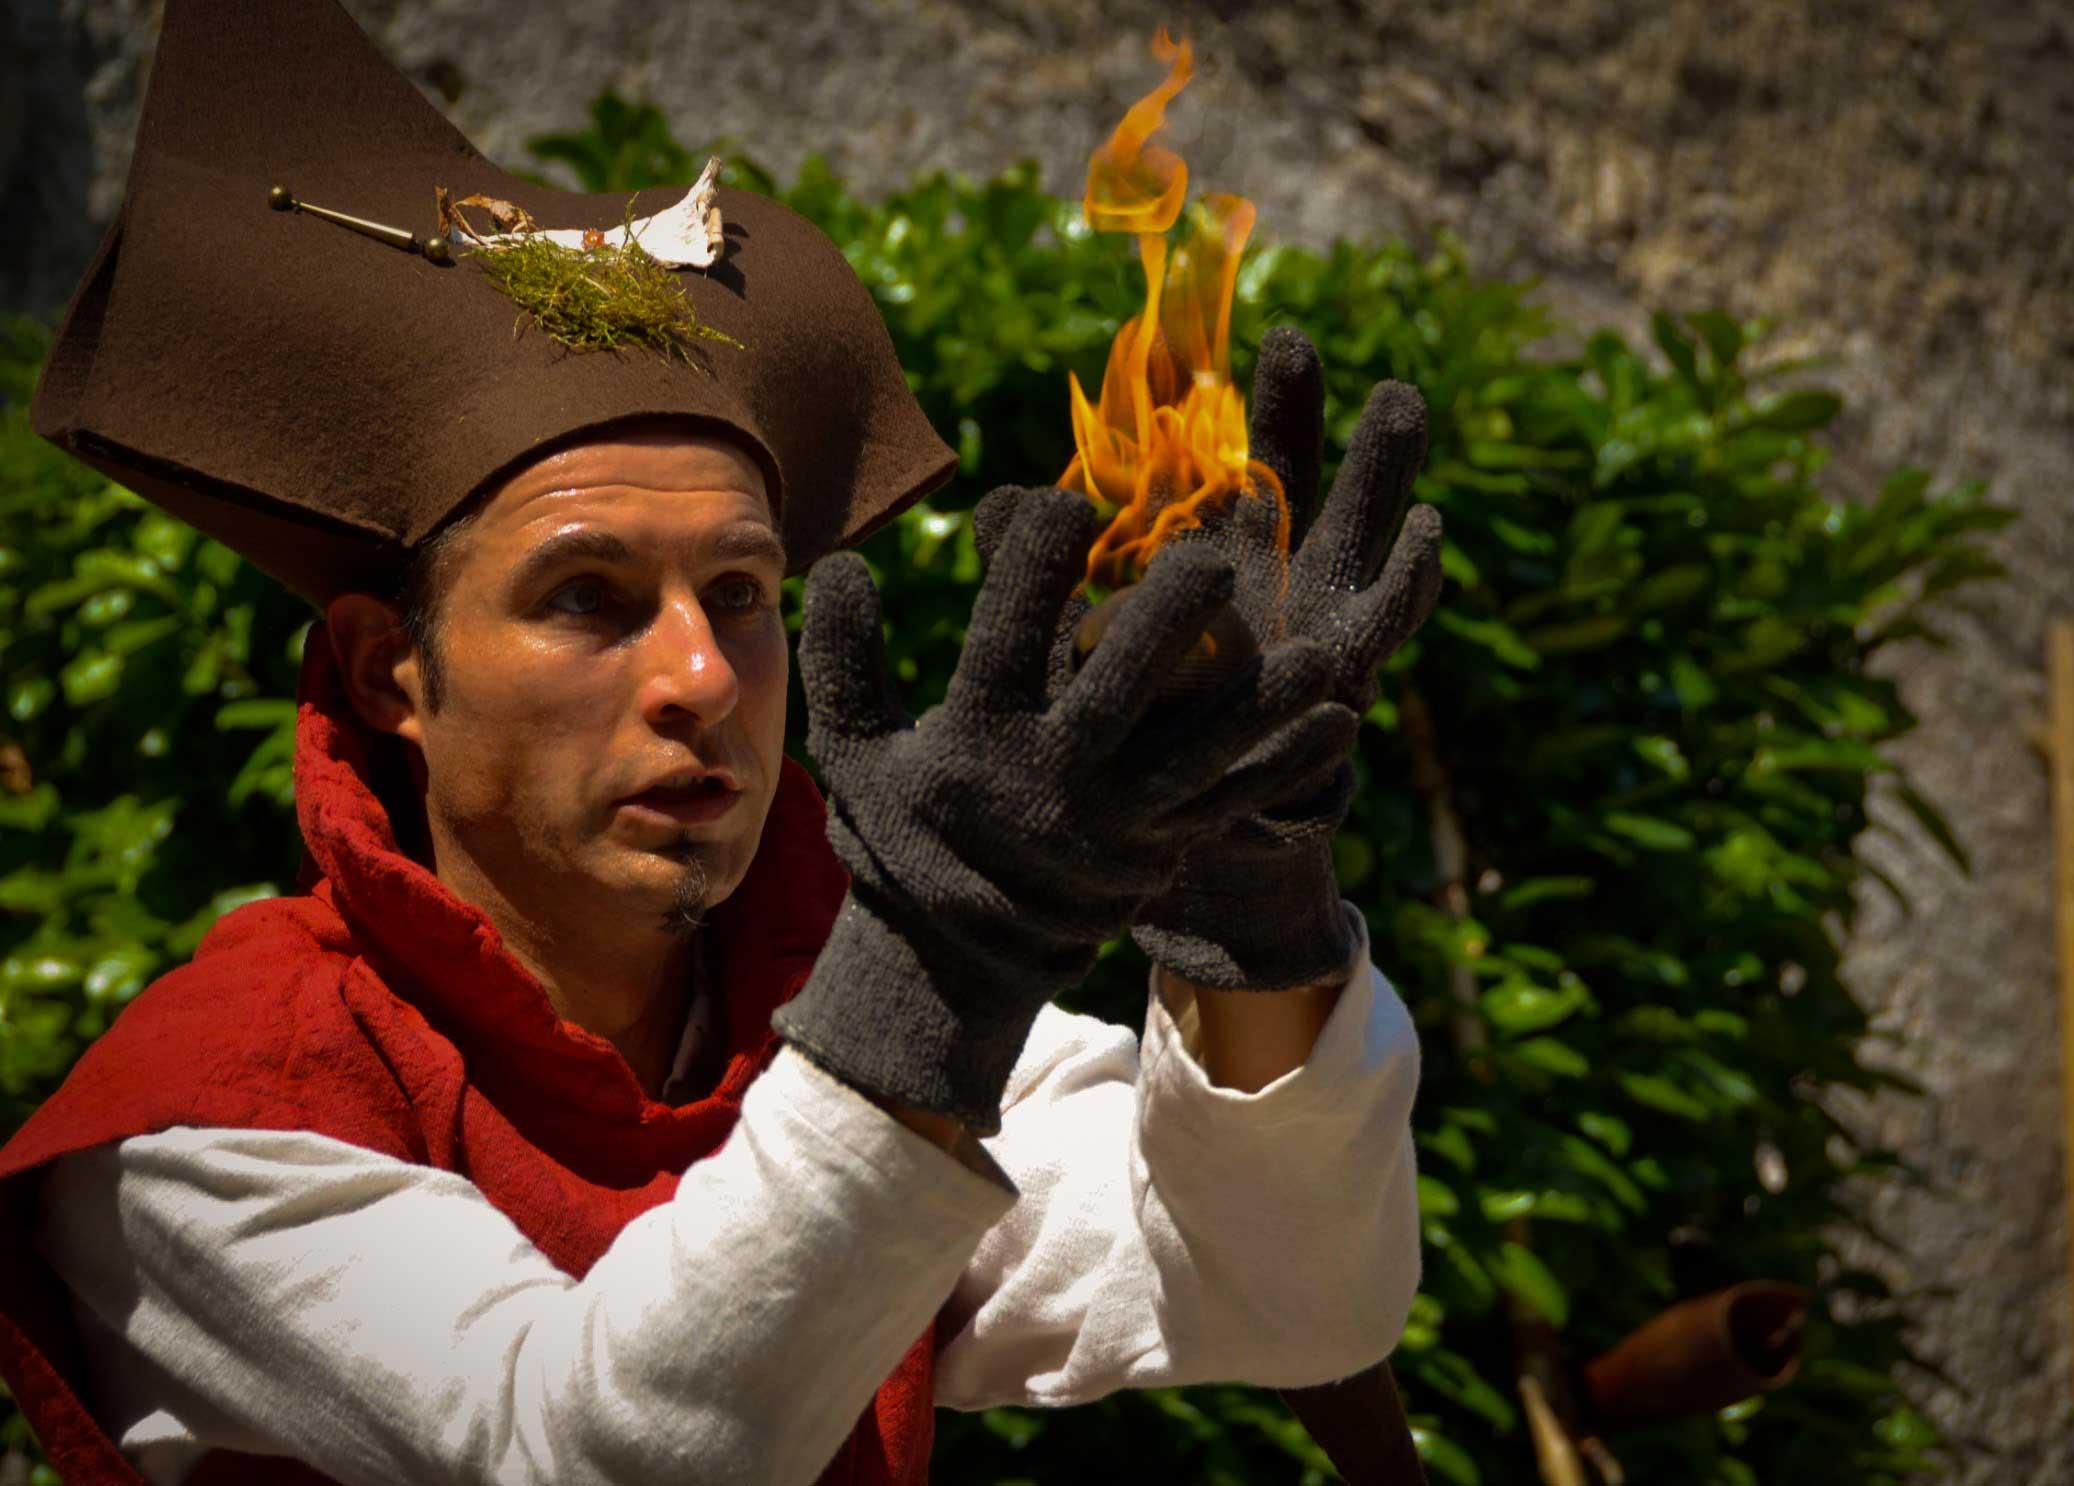 Flamme au Moyen-Âge